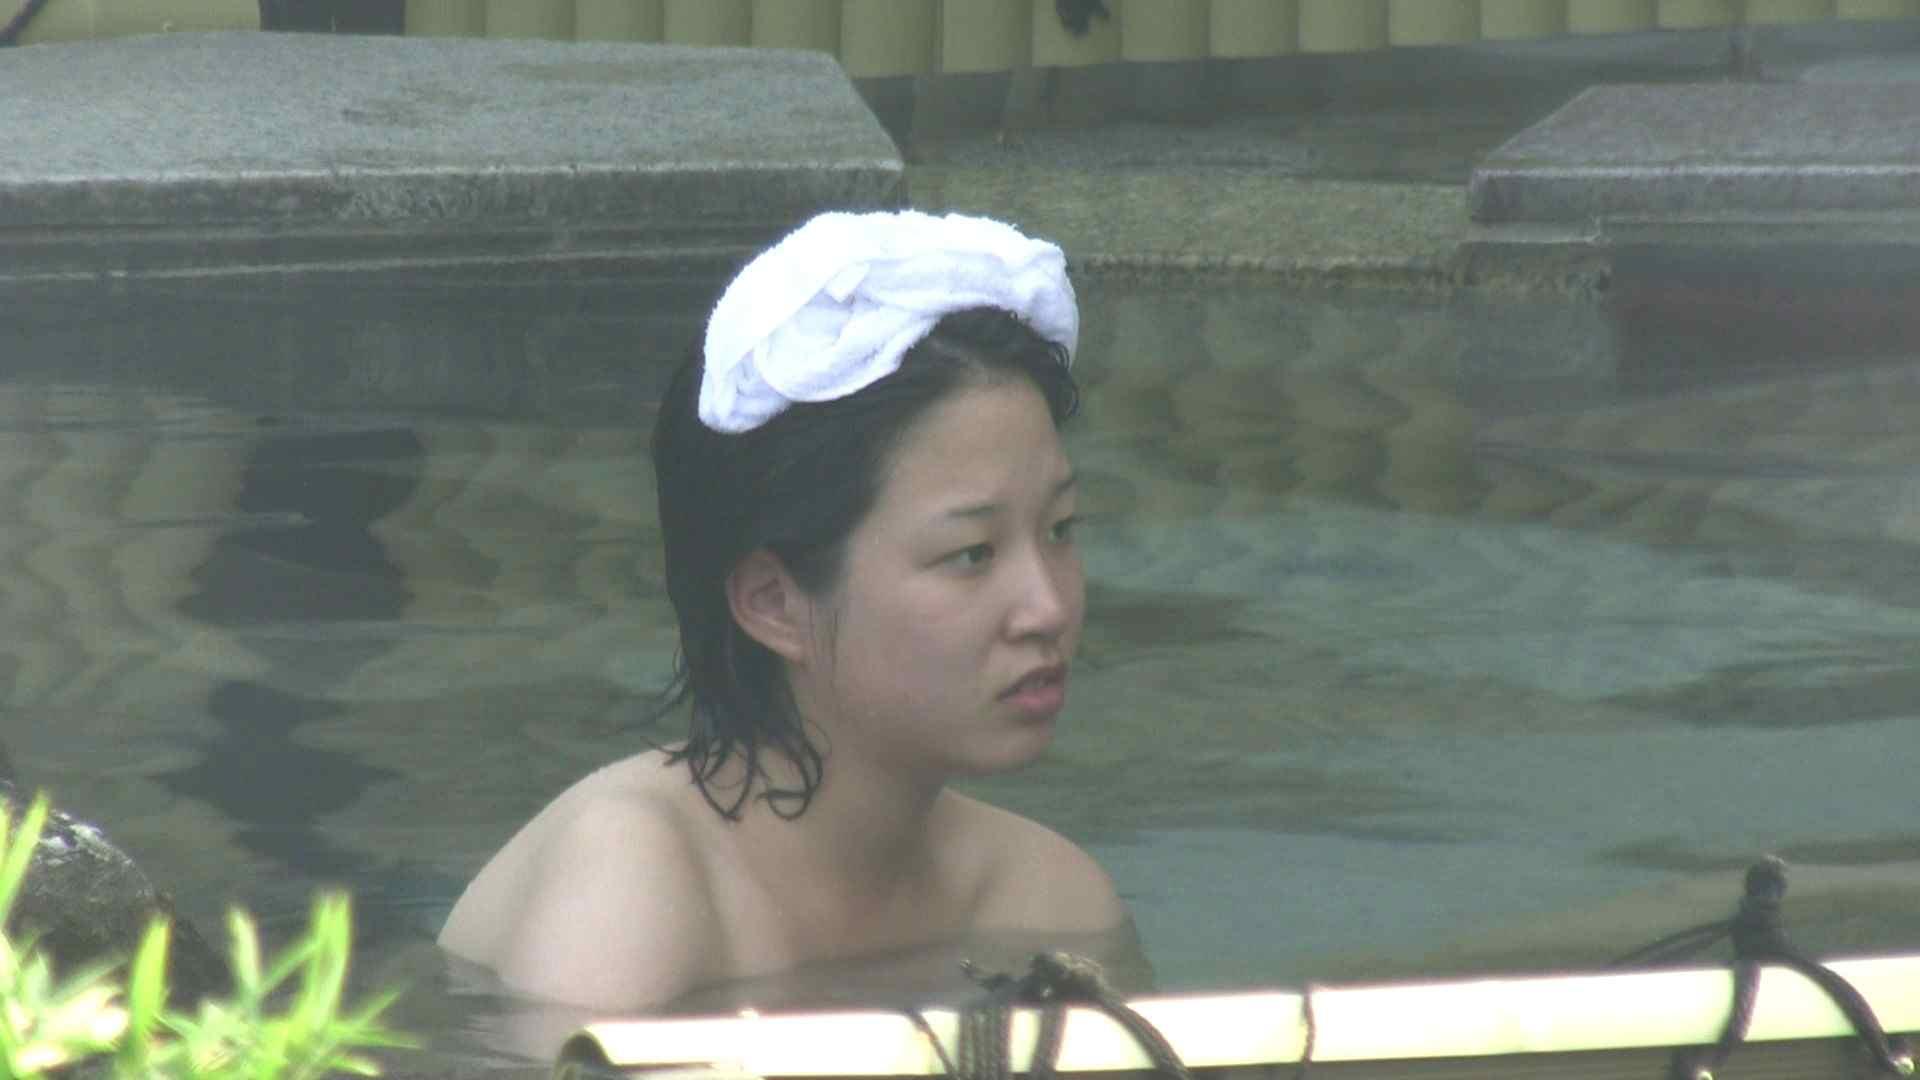 Aquaな露天風呂Vol.172 盗撮   HなOL  55pic 51